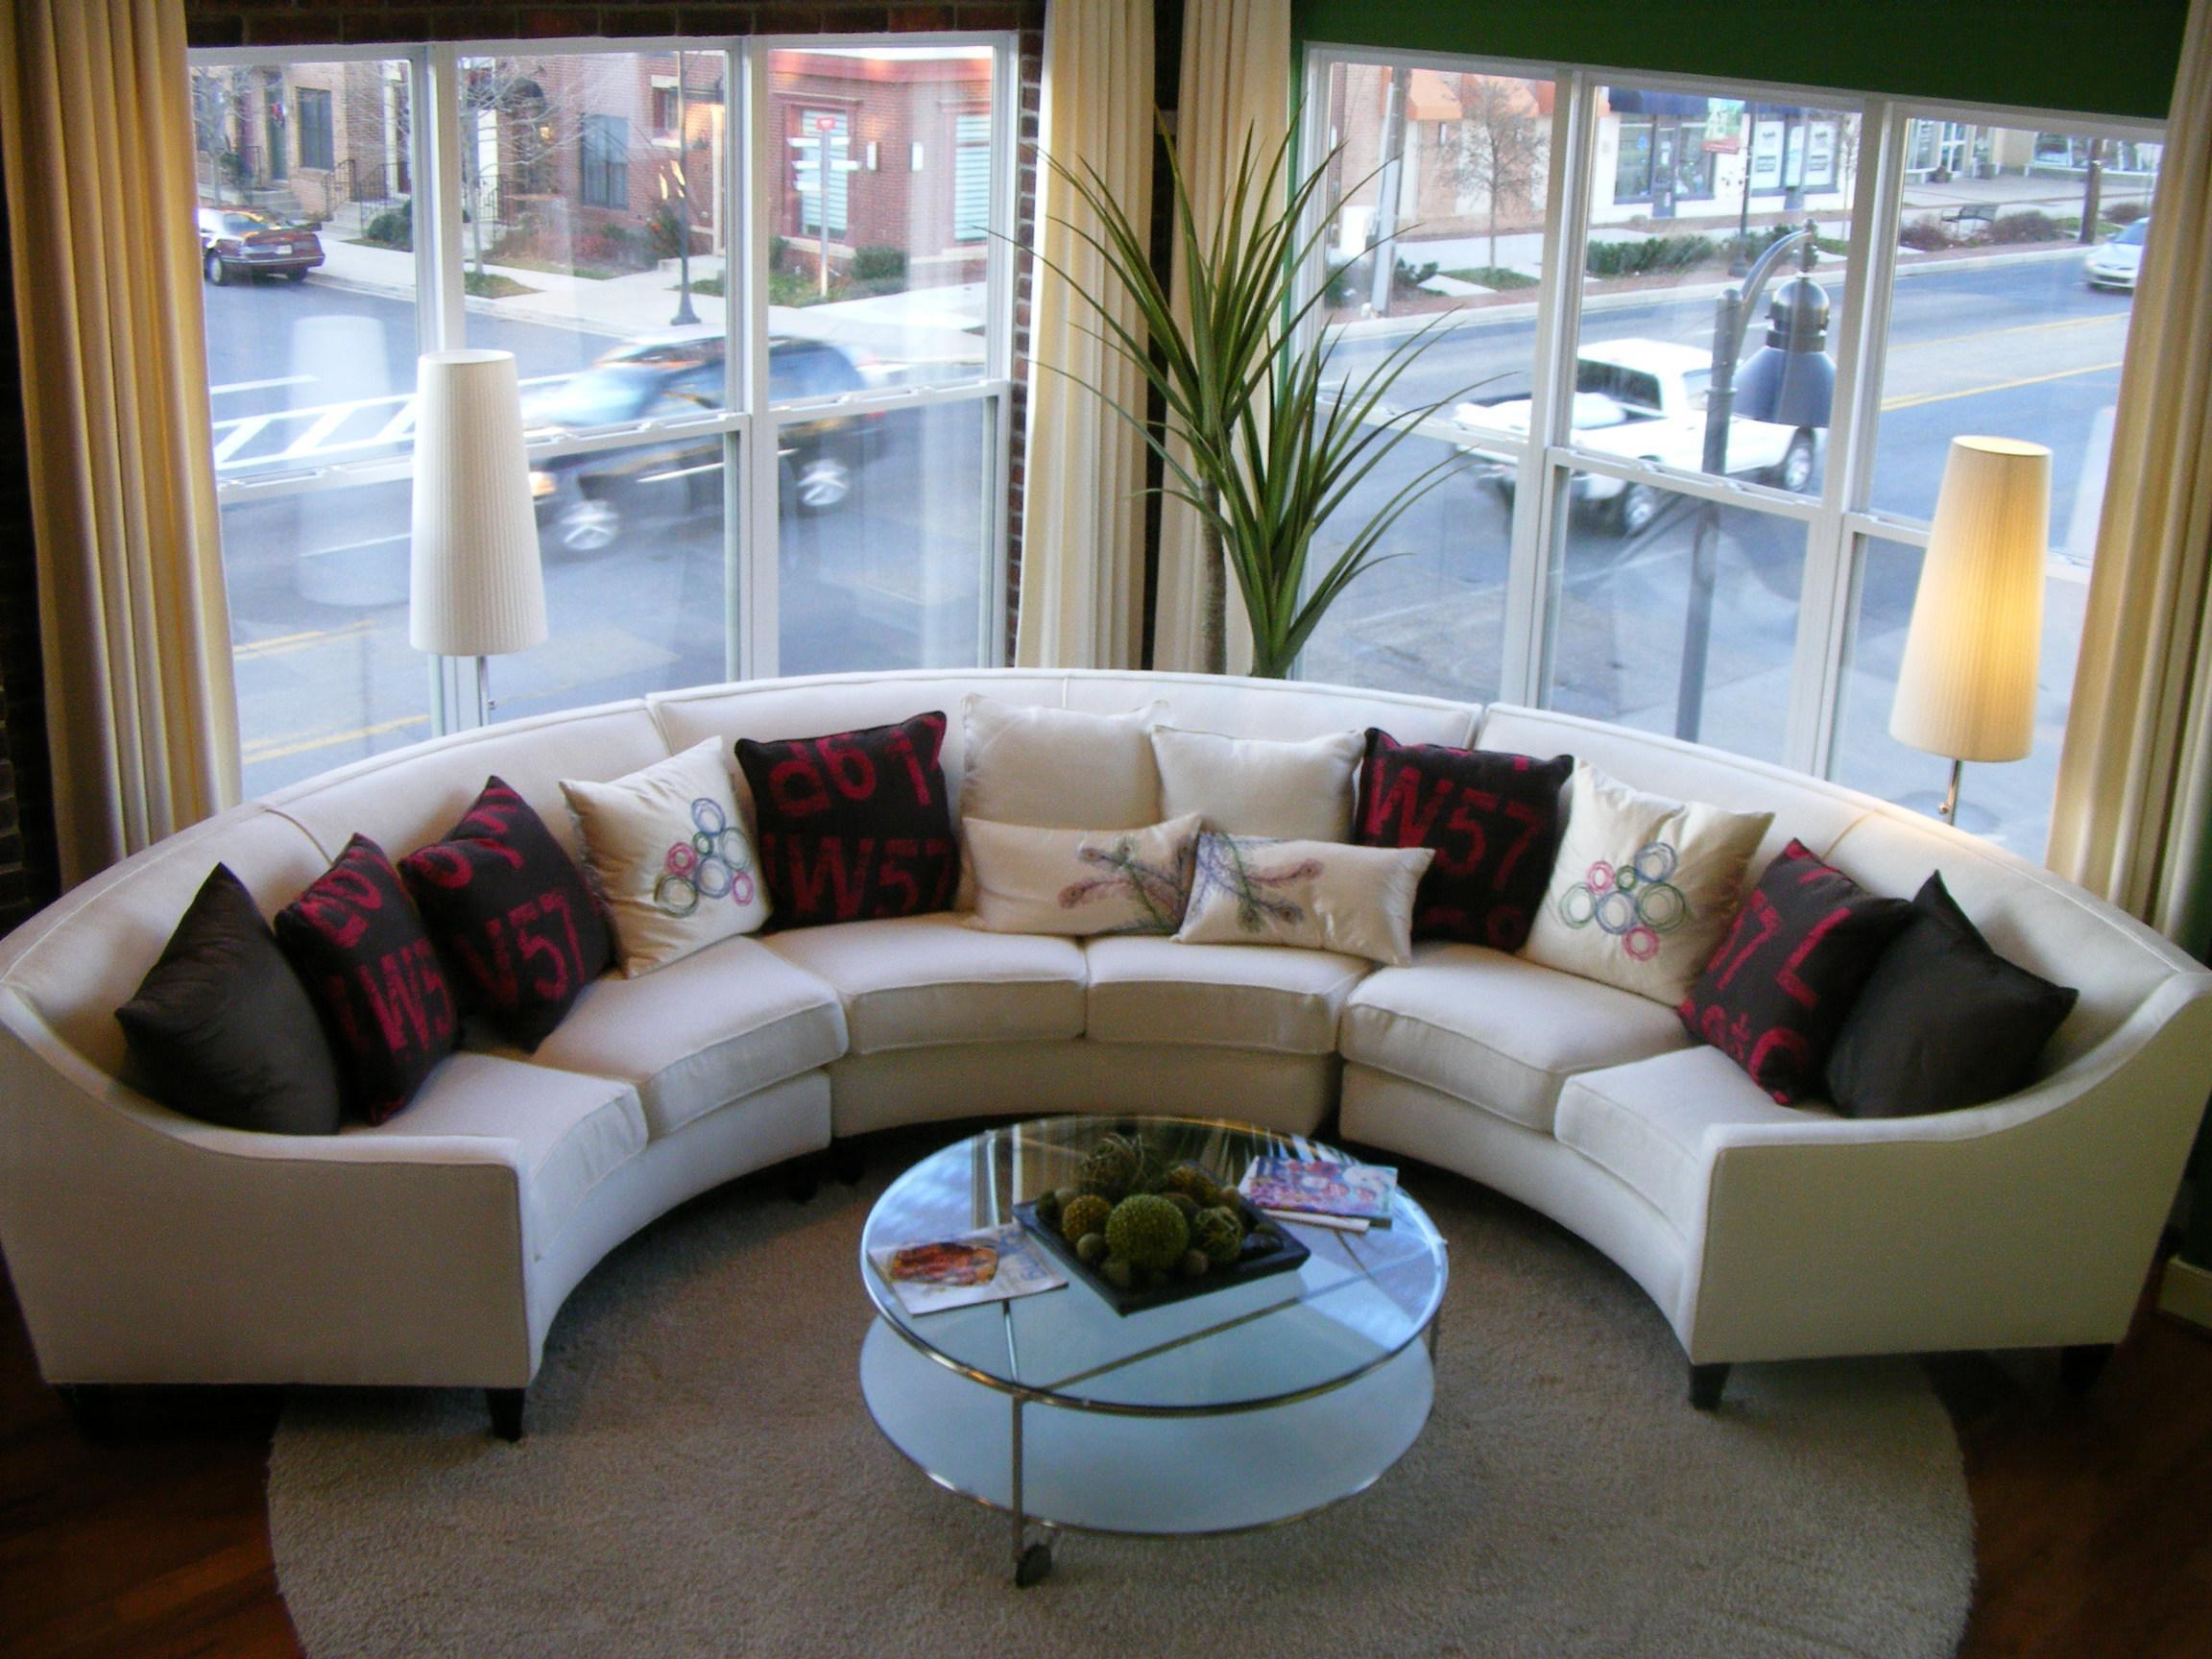 Sofas Center : Stirring Circle Sectional Sofa Photoncept Circular For Semi Sofas (Image 20 of 20)